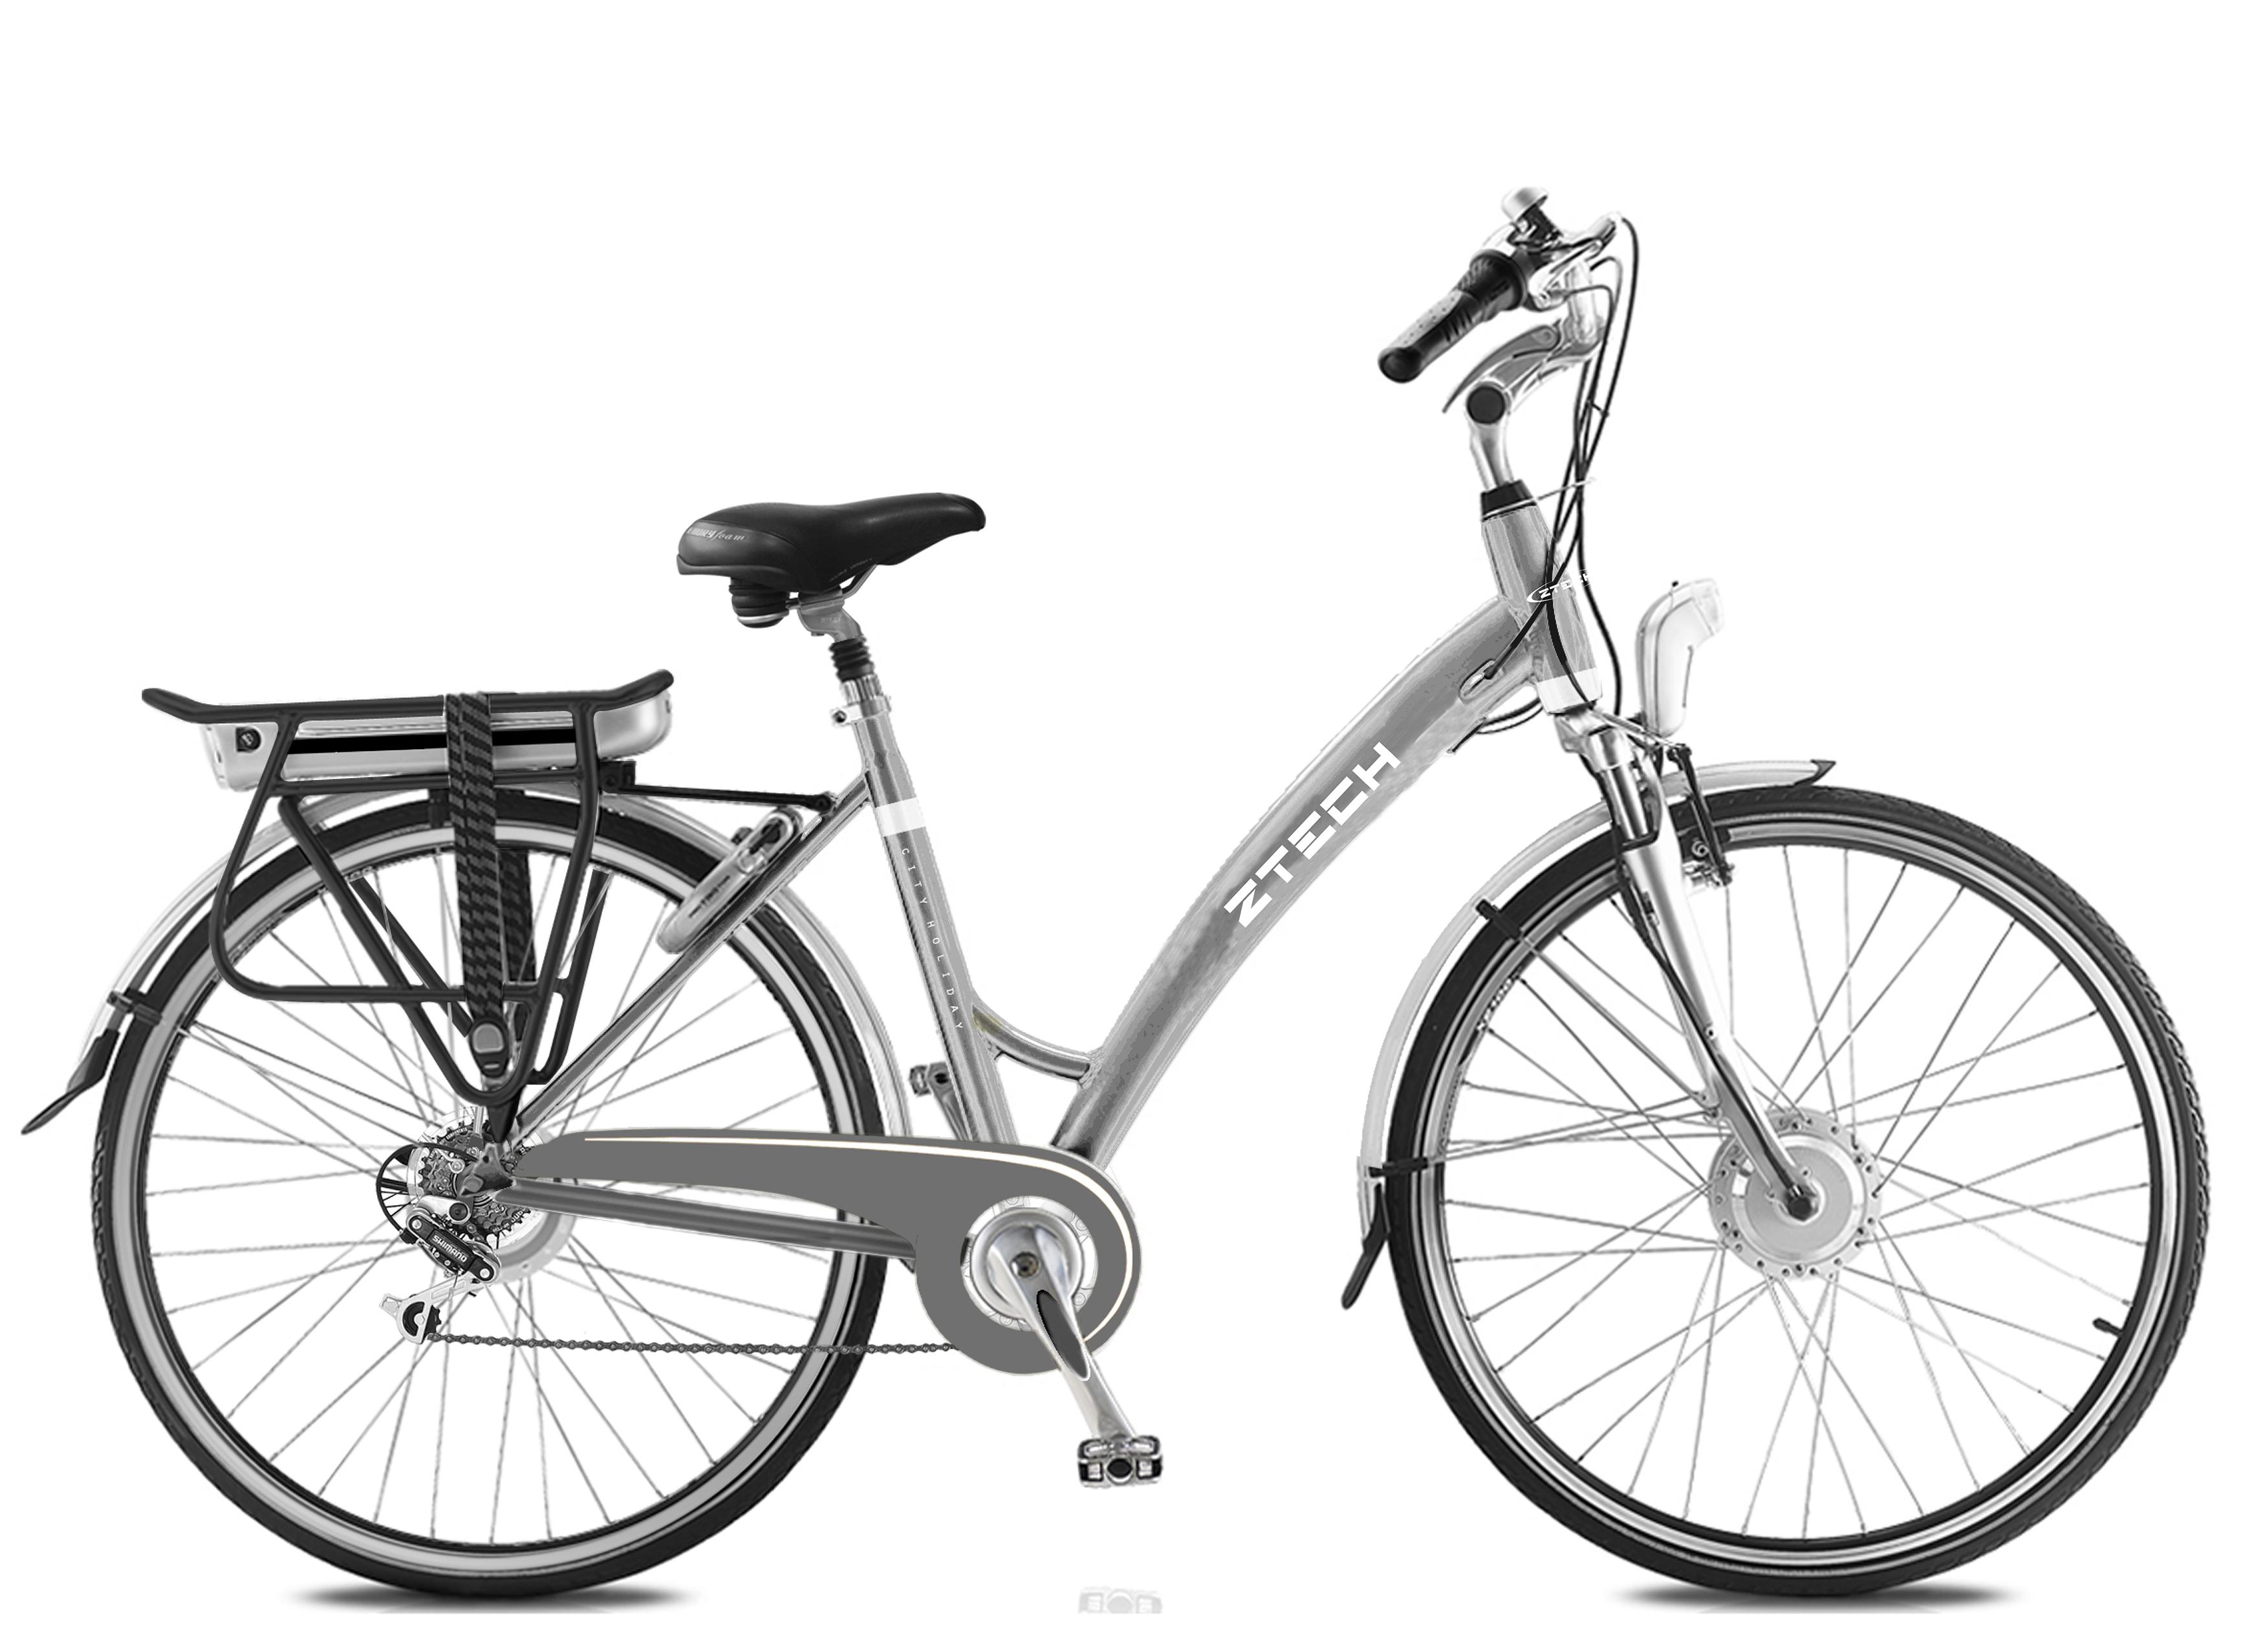 Bicicleta electrica Ztech ZT-76 Holiday